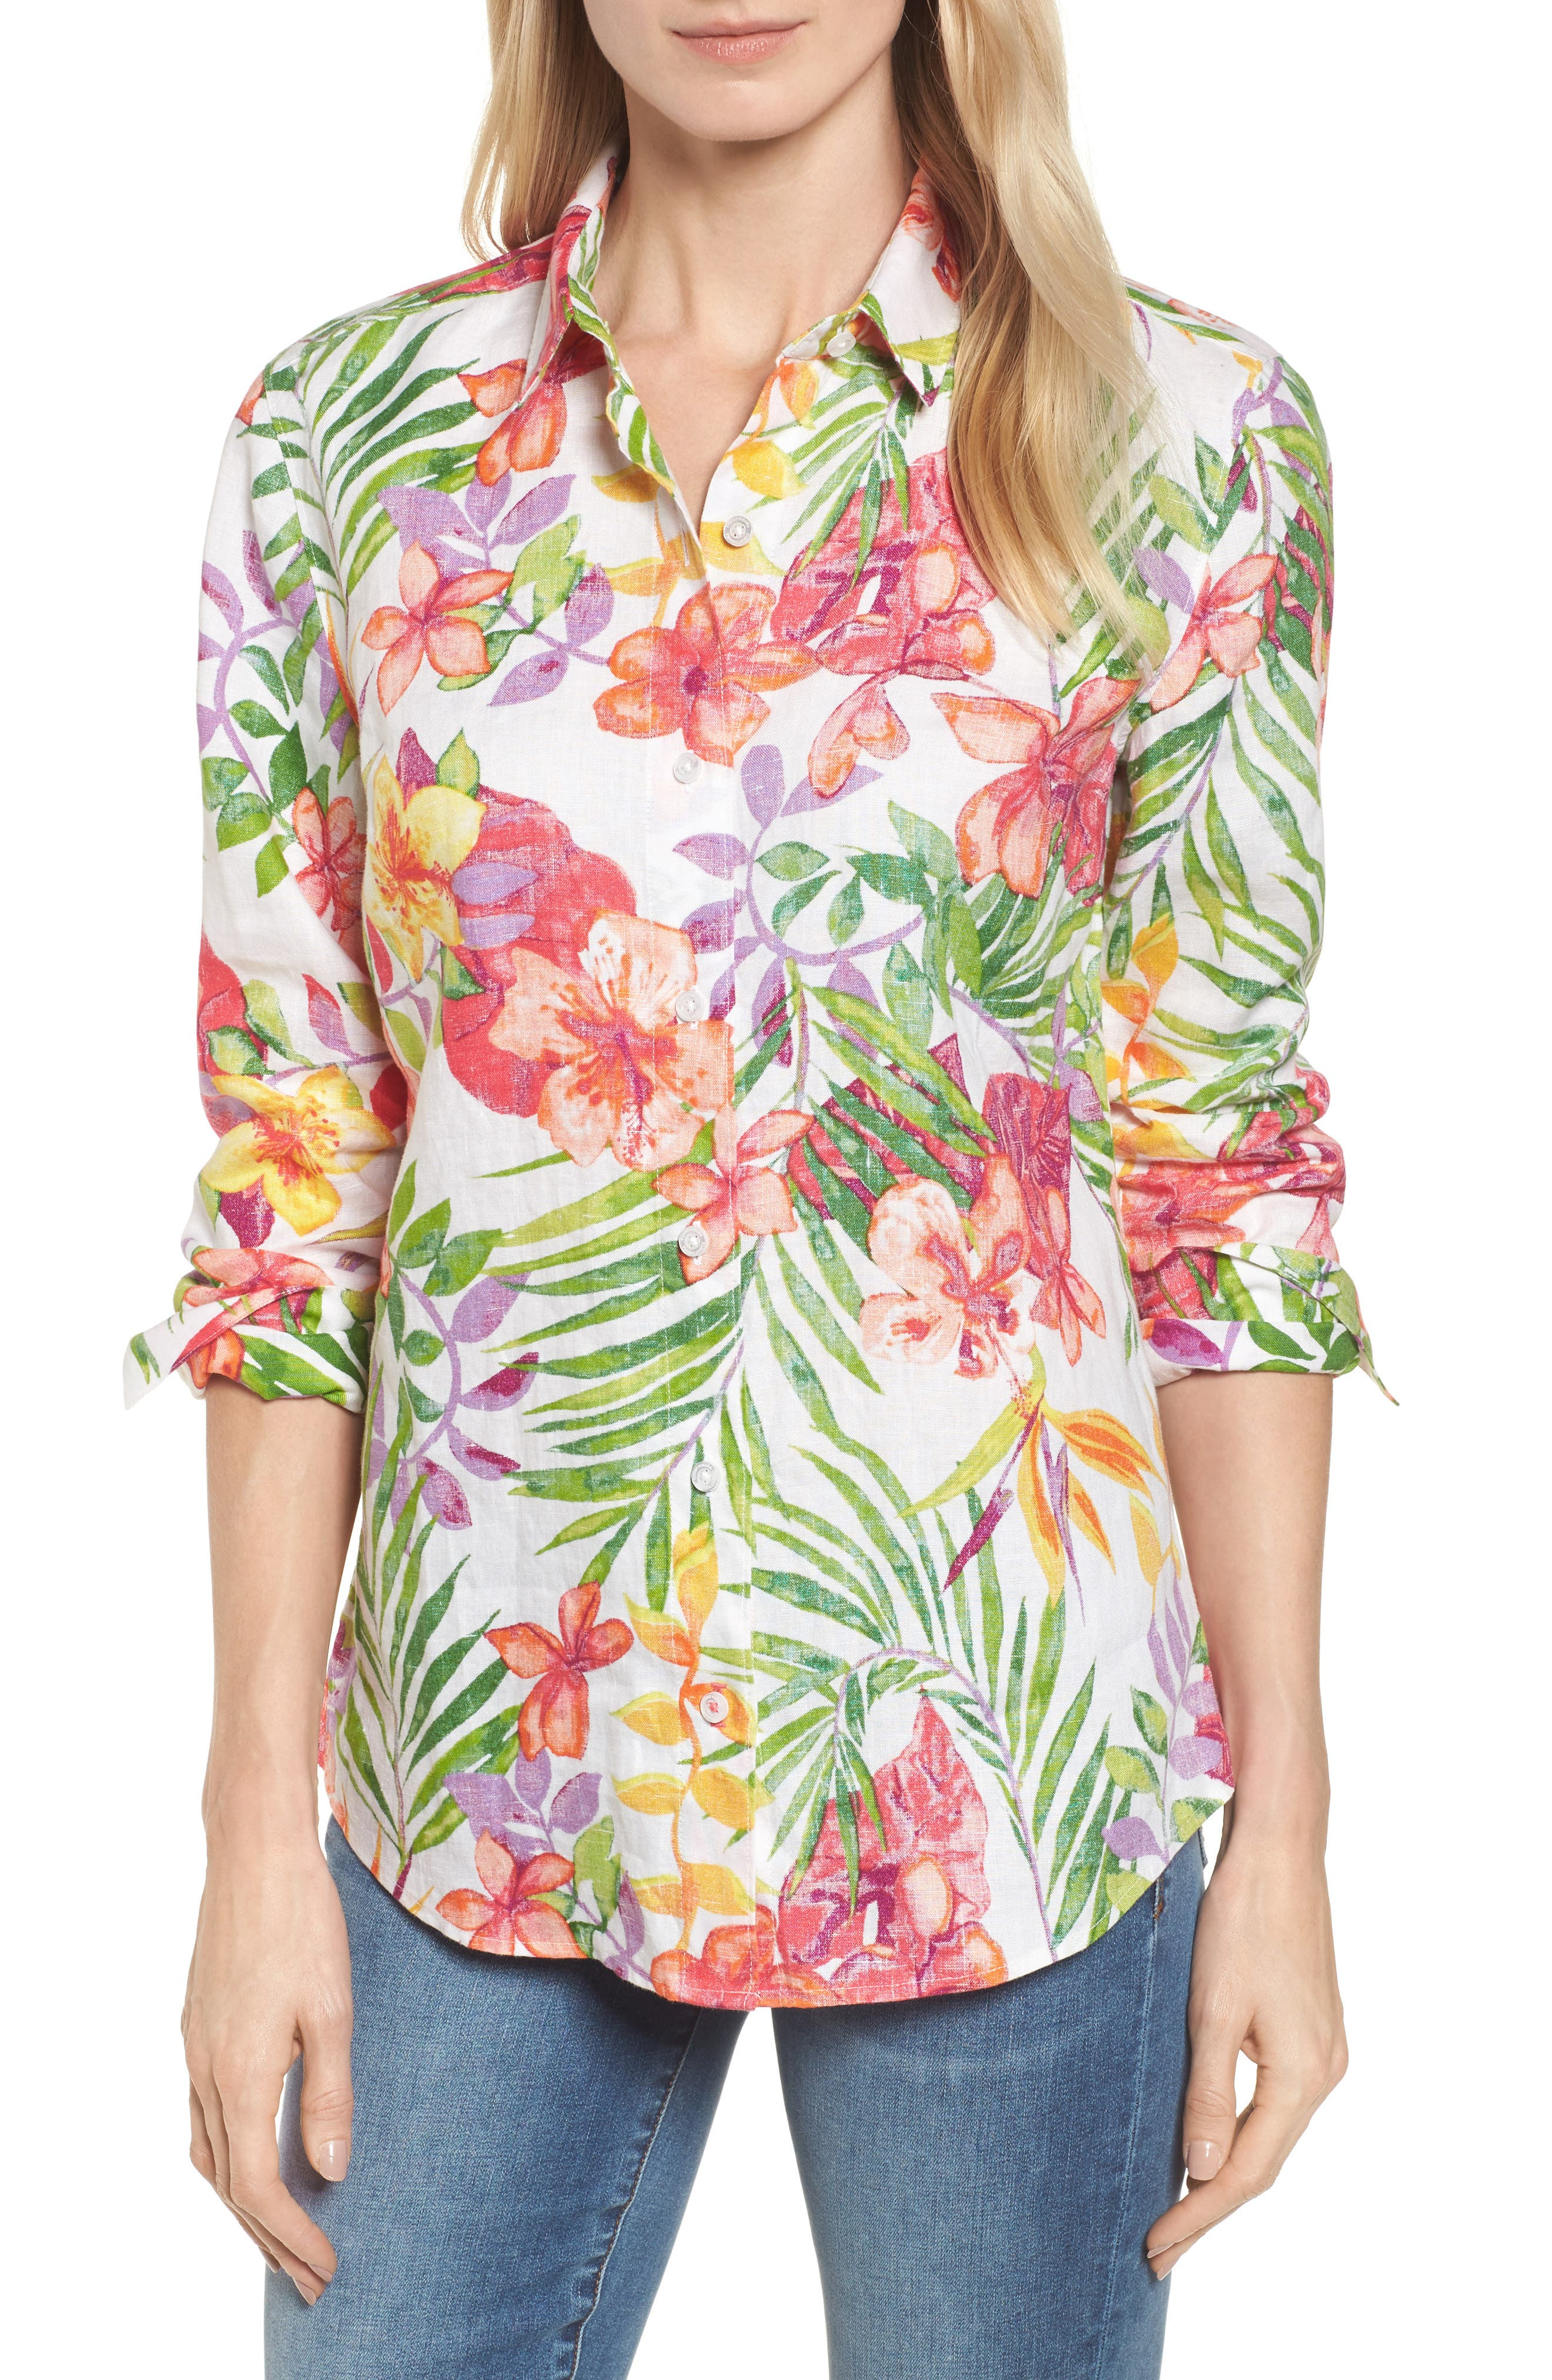 Main Image - Tommy Bahama Marabella Blooms Button Down Shirt